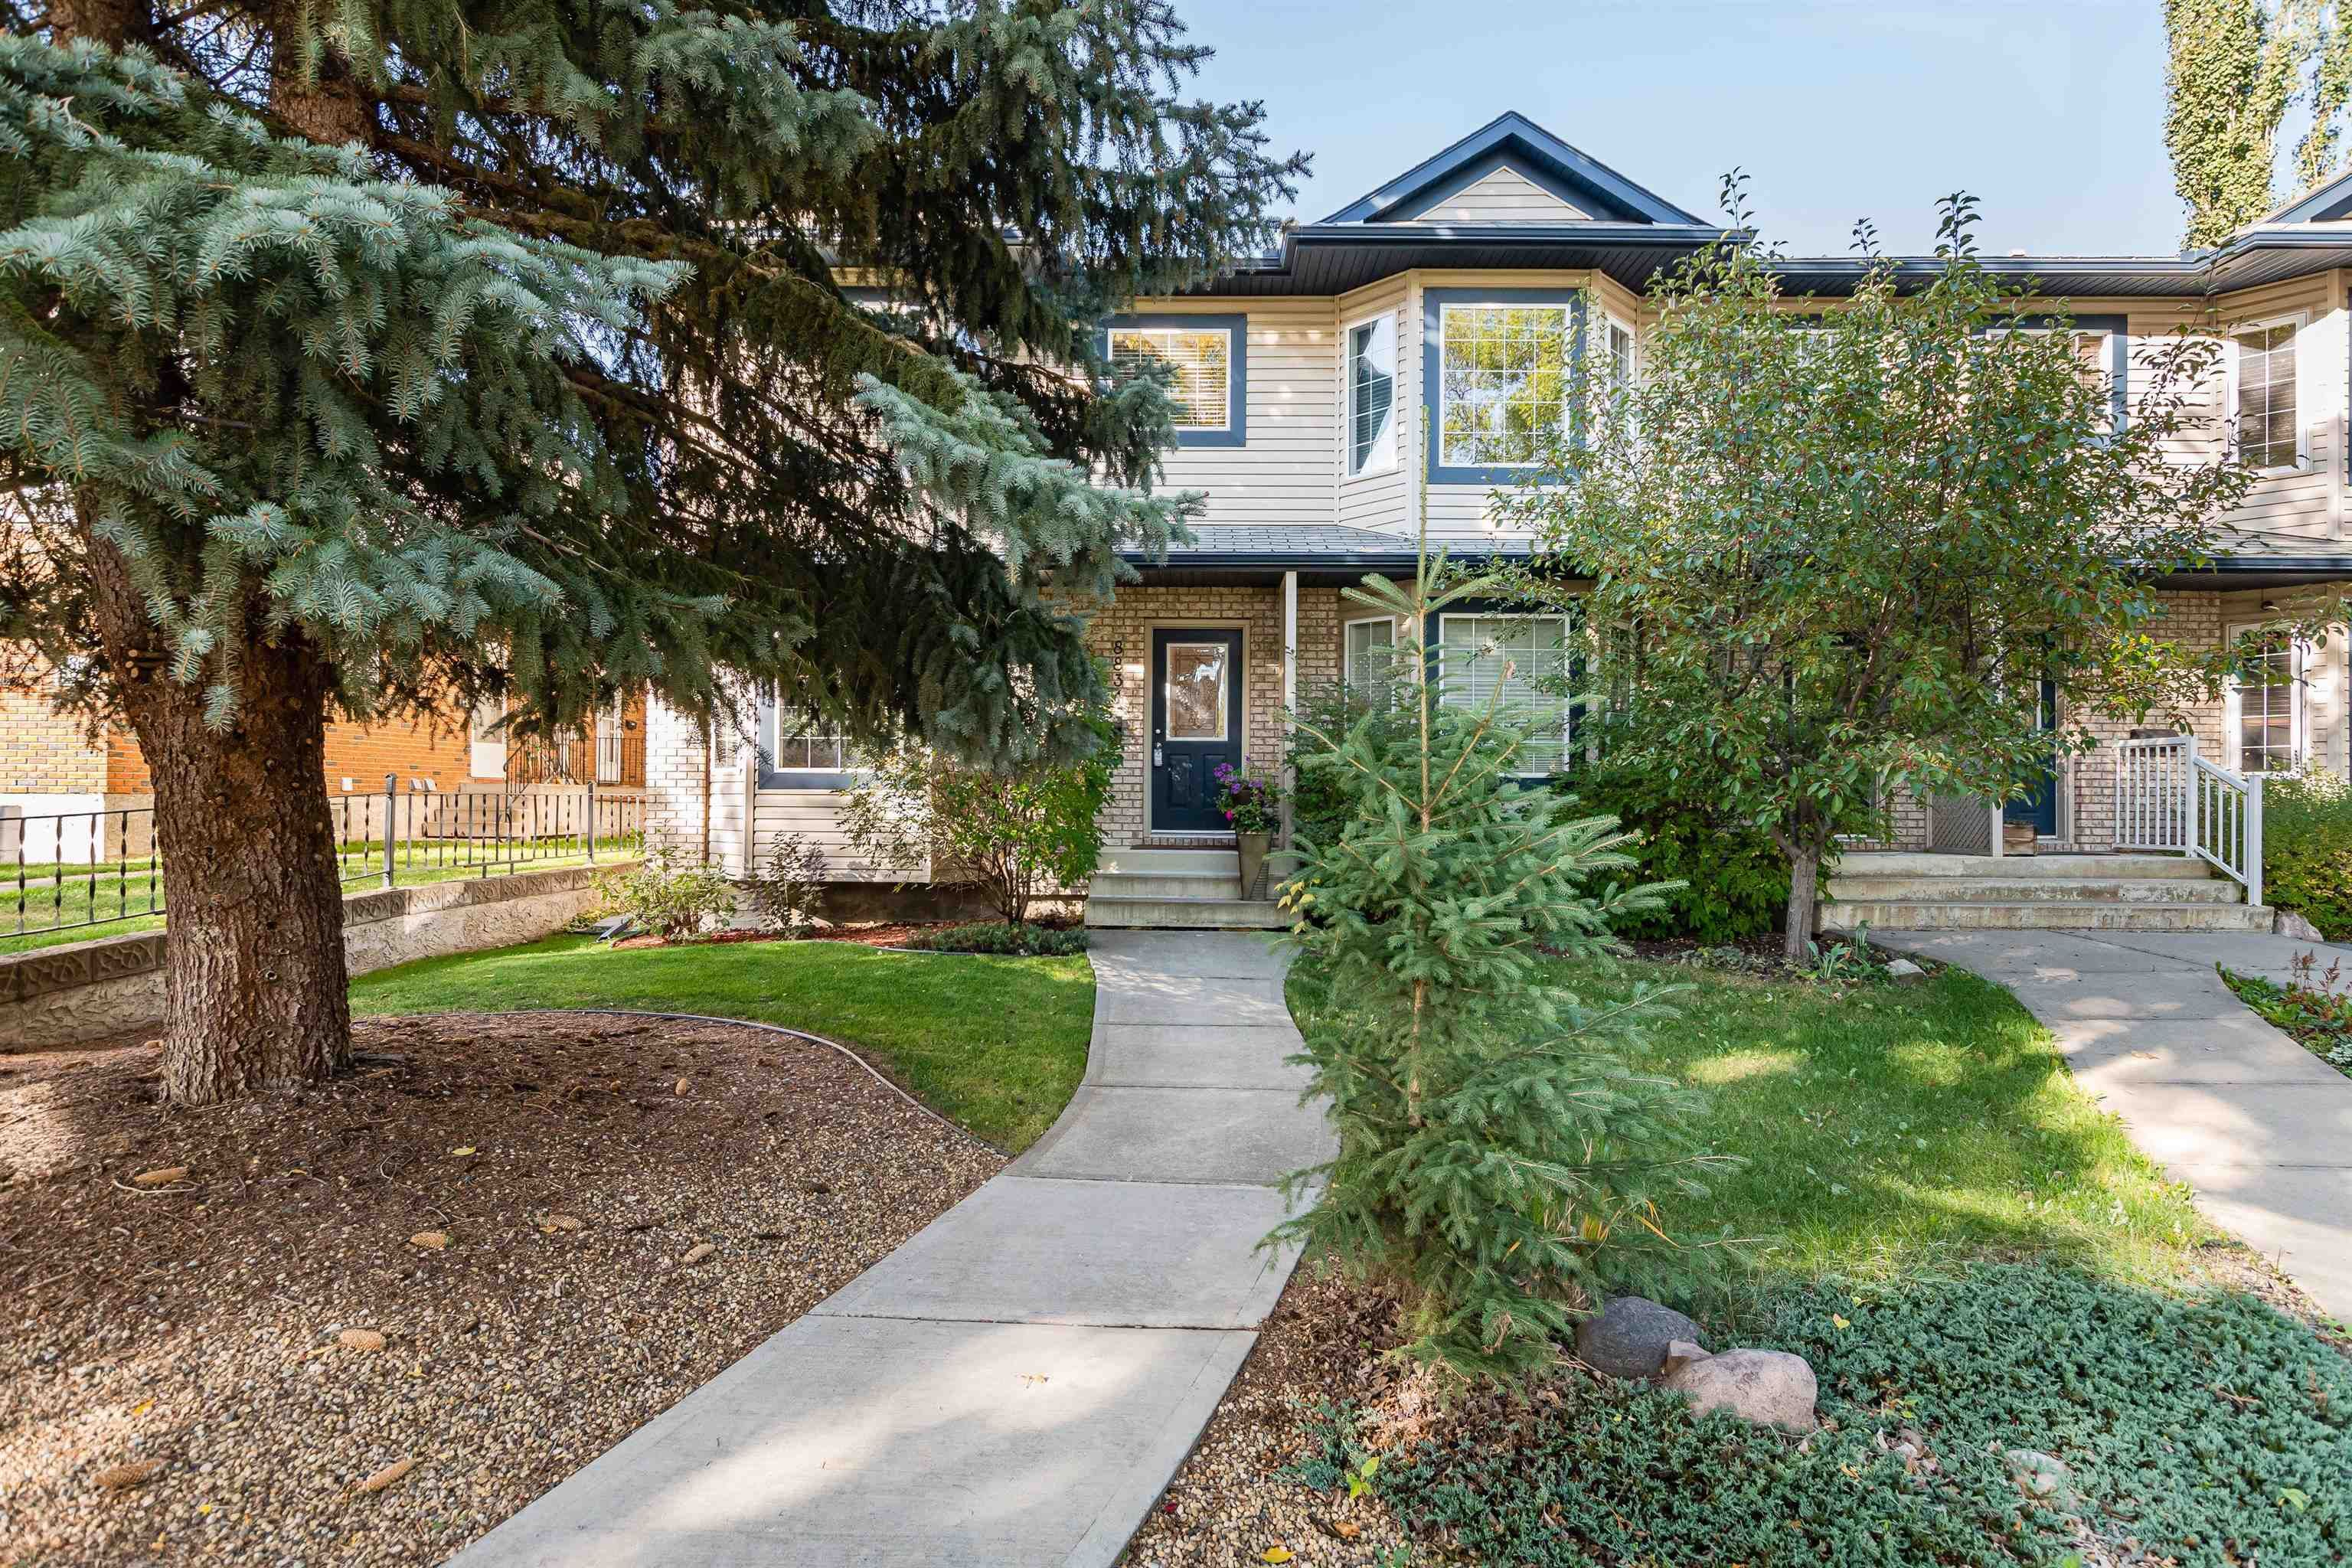 Main Photo: 8834 94 Street in Edmonton: Zone 18 House Half Duplex for sale : MLS®# E4264201